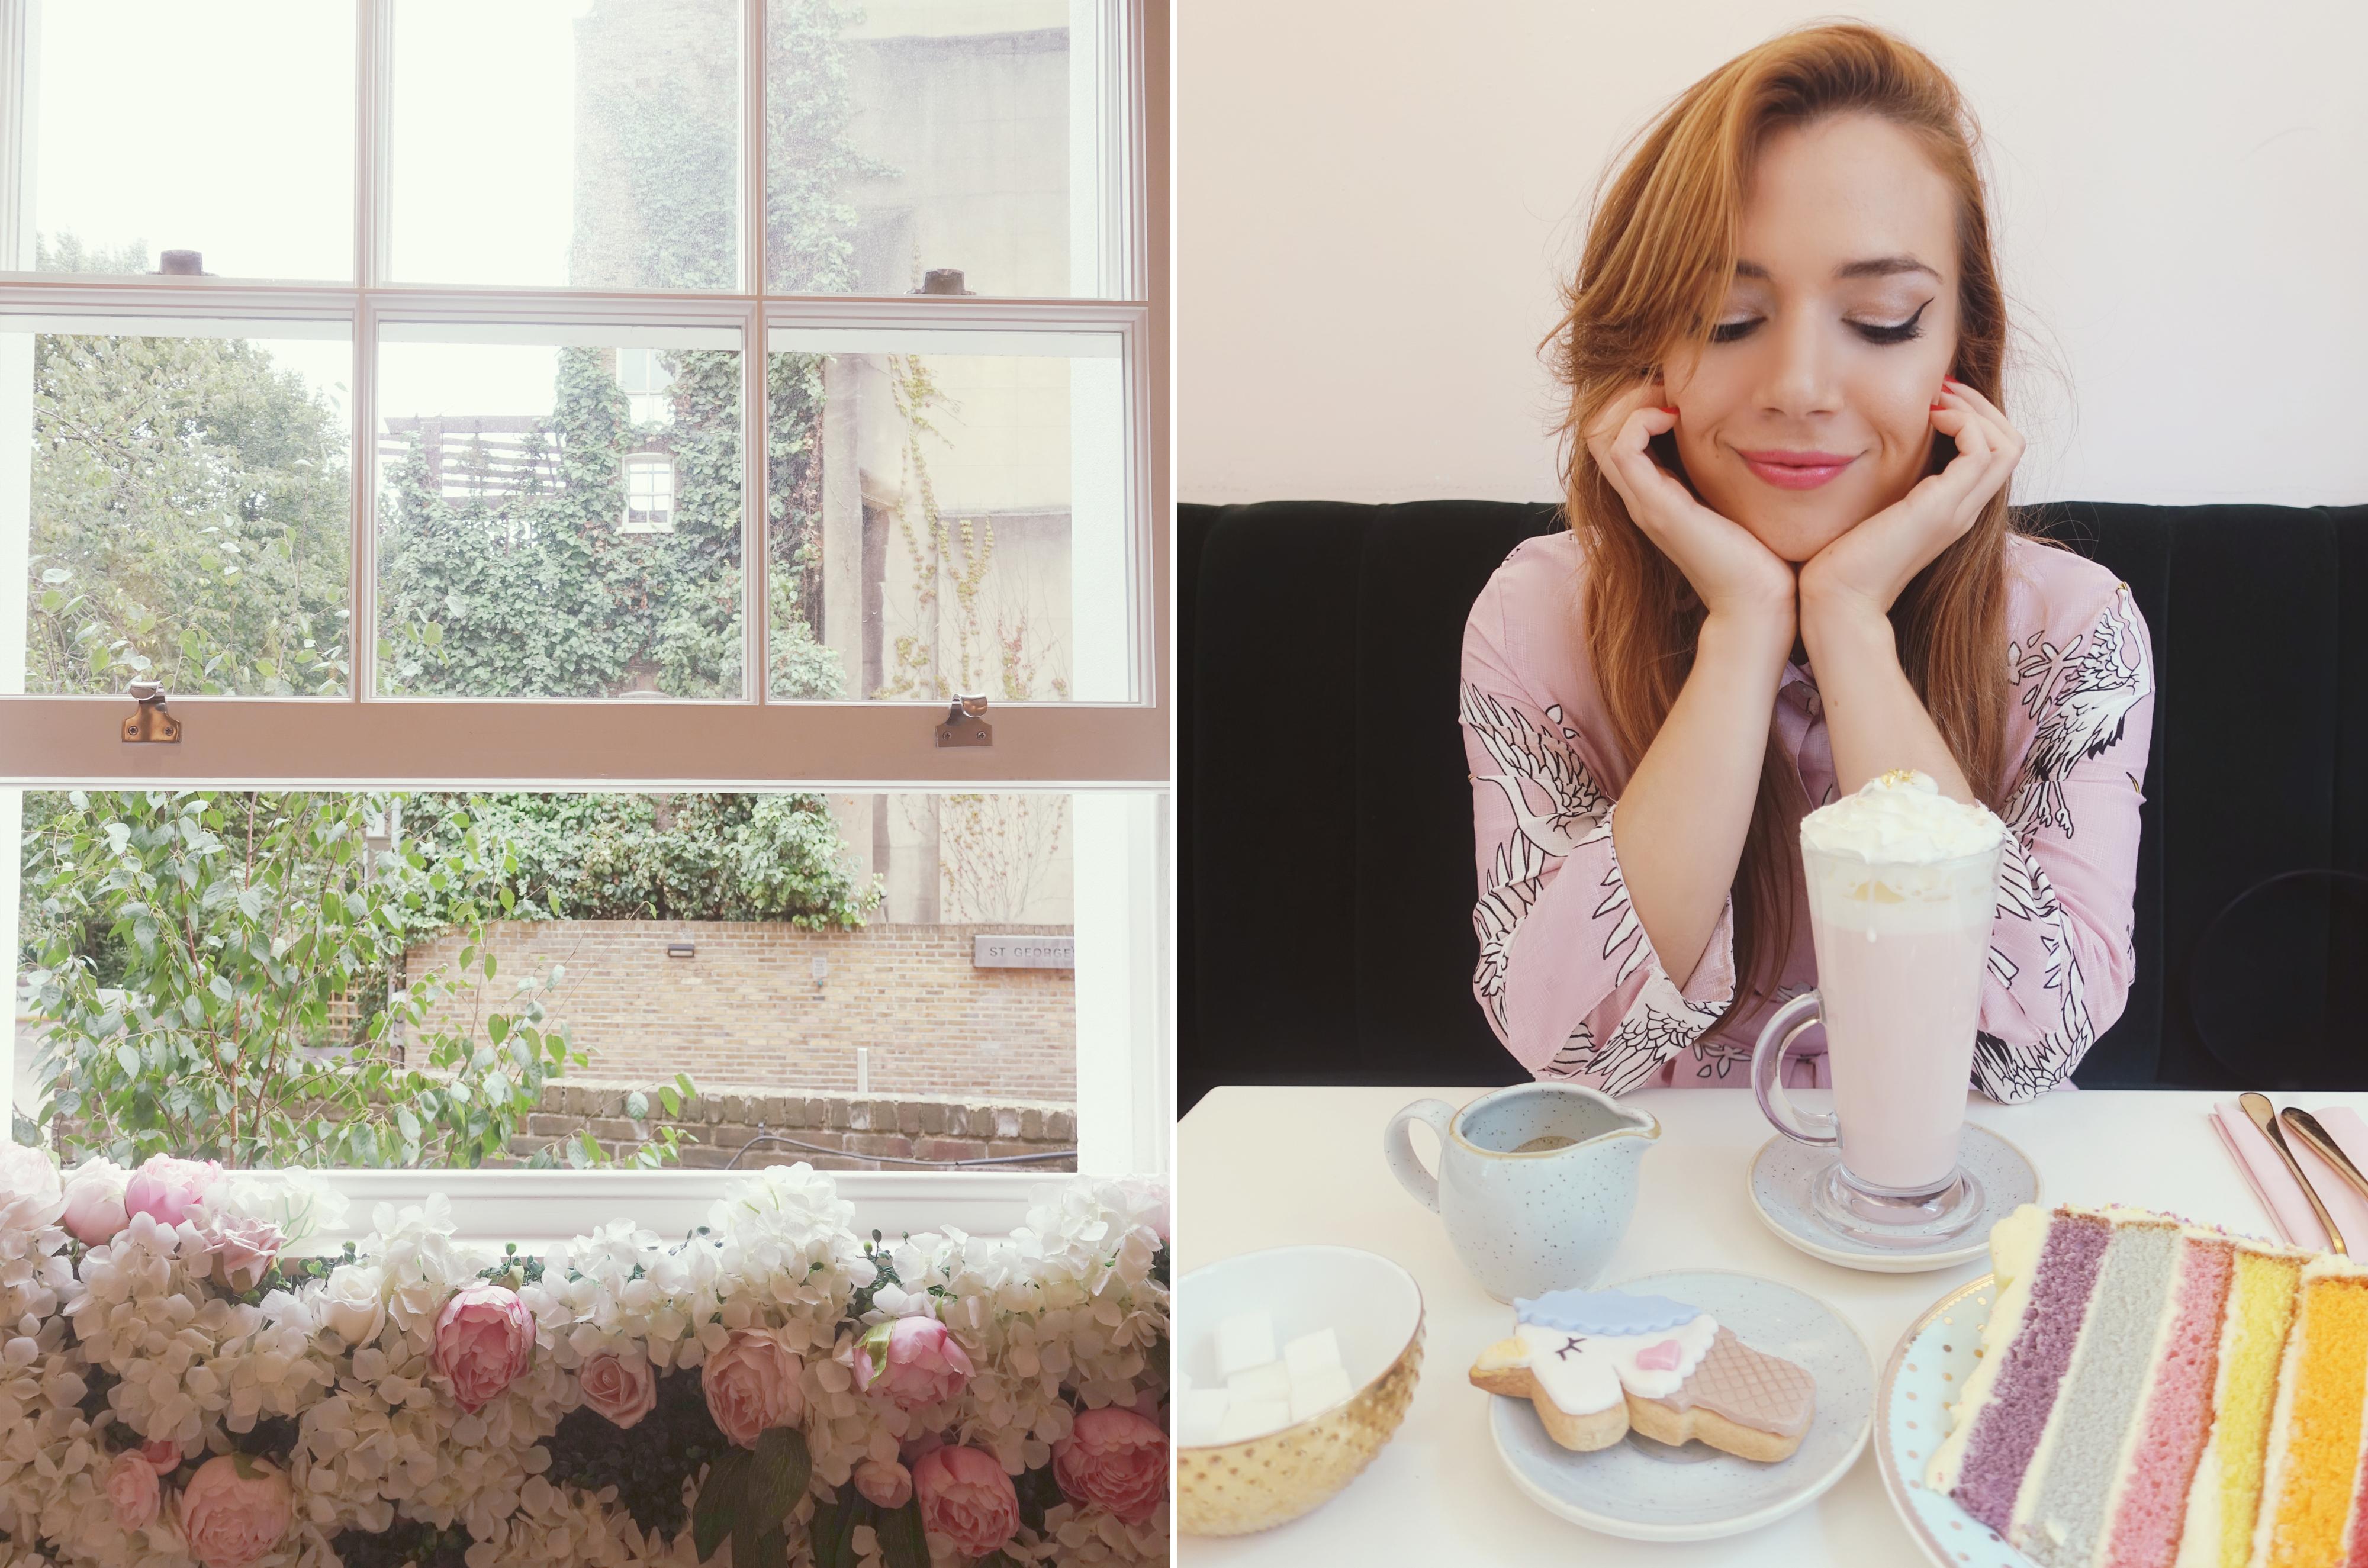 saint-aymes-pink-cafe-london-PiensaenChic-influencer-ChicAdicta-blog-de-moda-vestido-smile-look-rosa-fashion-travel-Chic-adicta-Piensa-en-Chic-unicorn-cookie-tarta-de-arcoiris